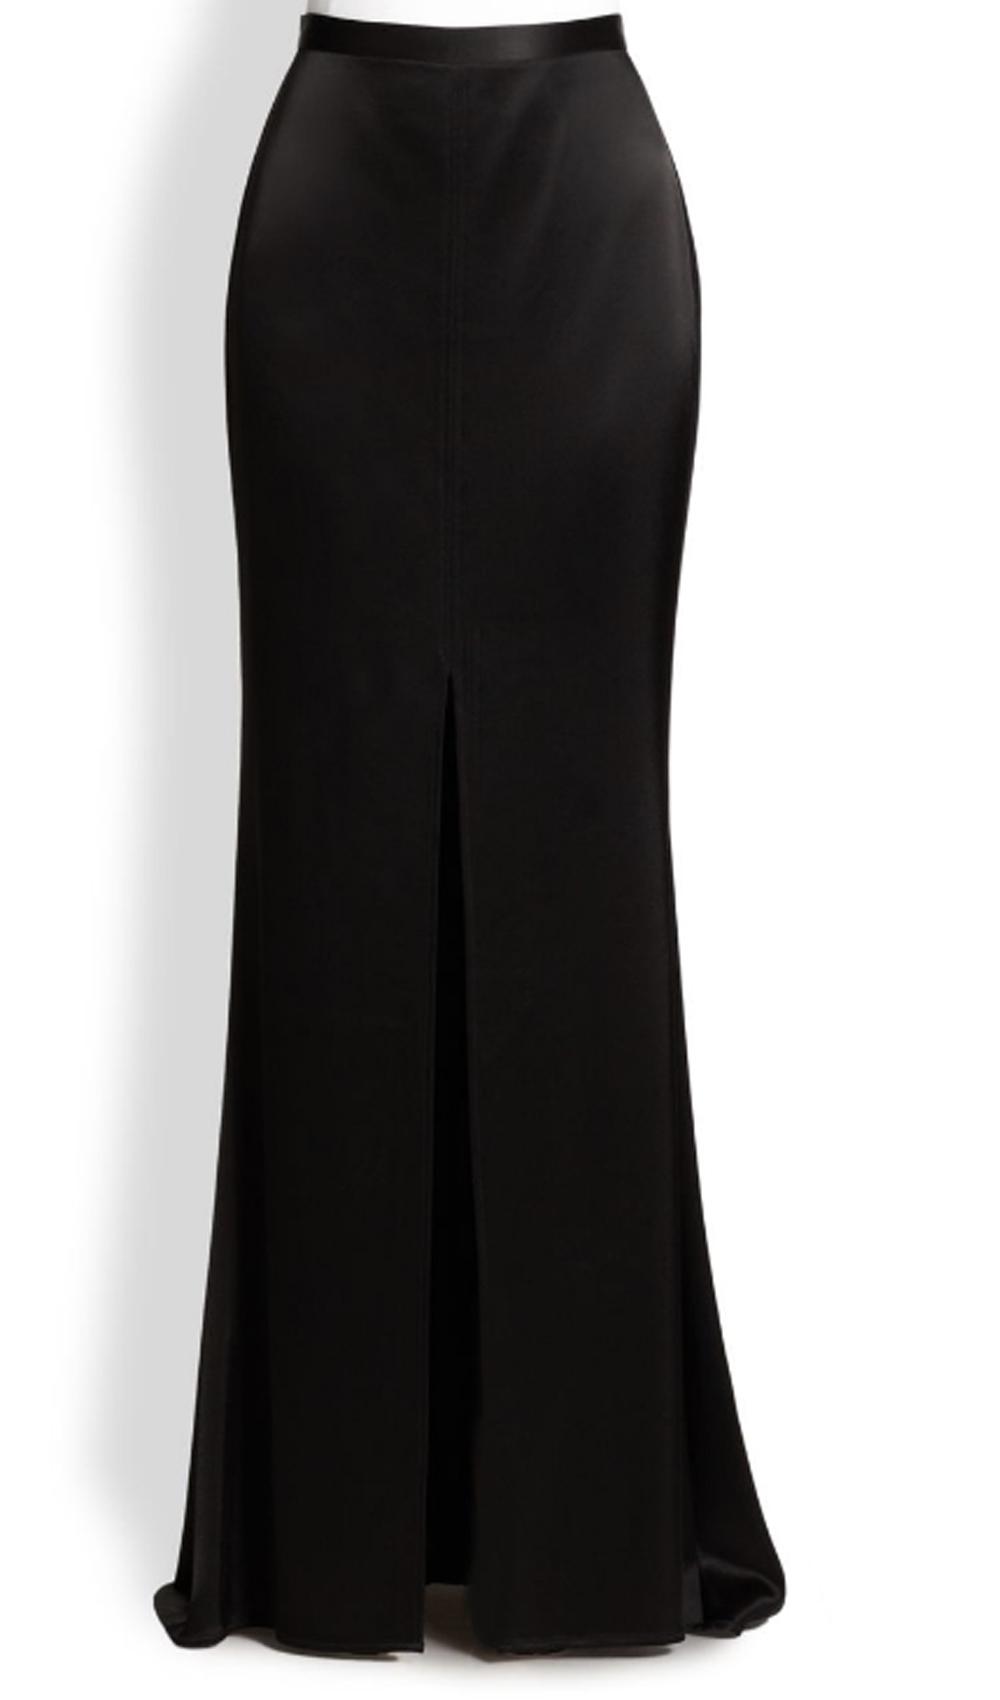 Black Satin Maxi Skirt with open Front Split  Elizabeths Custom Skirts